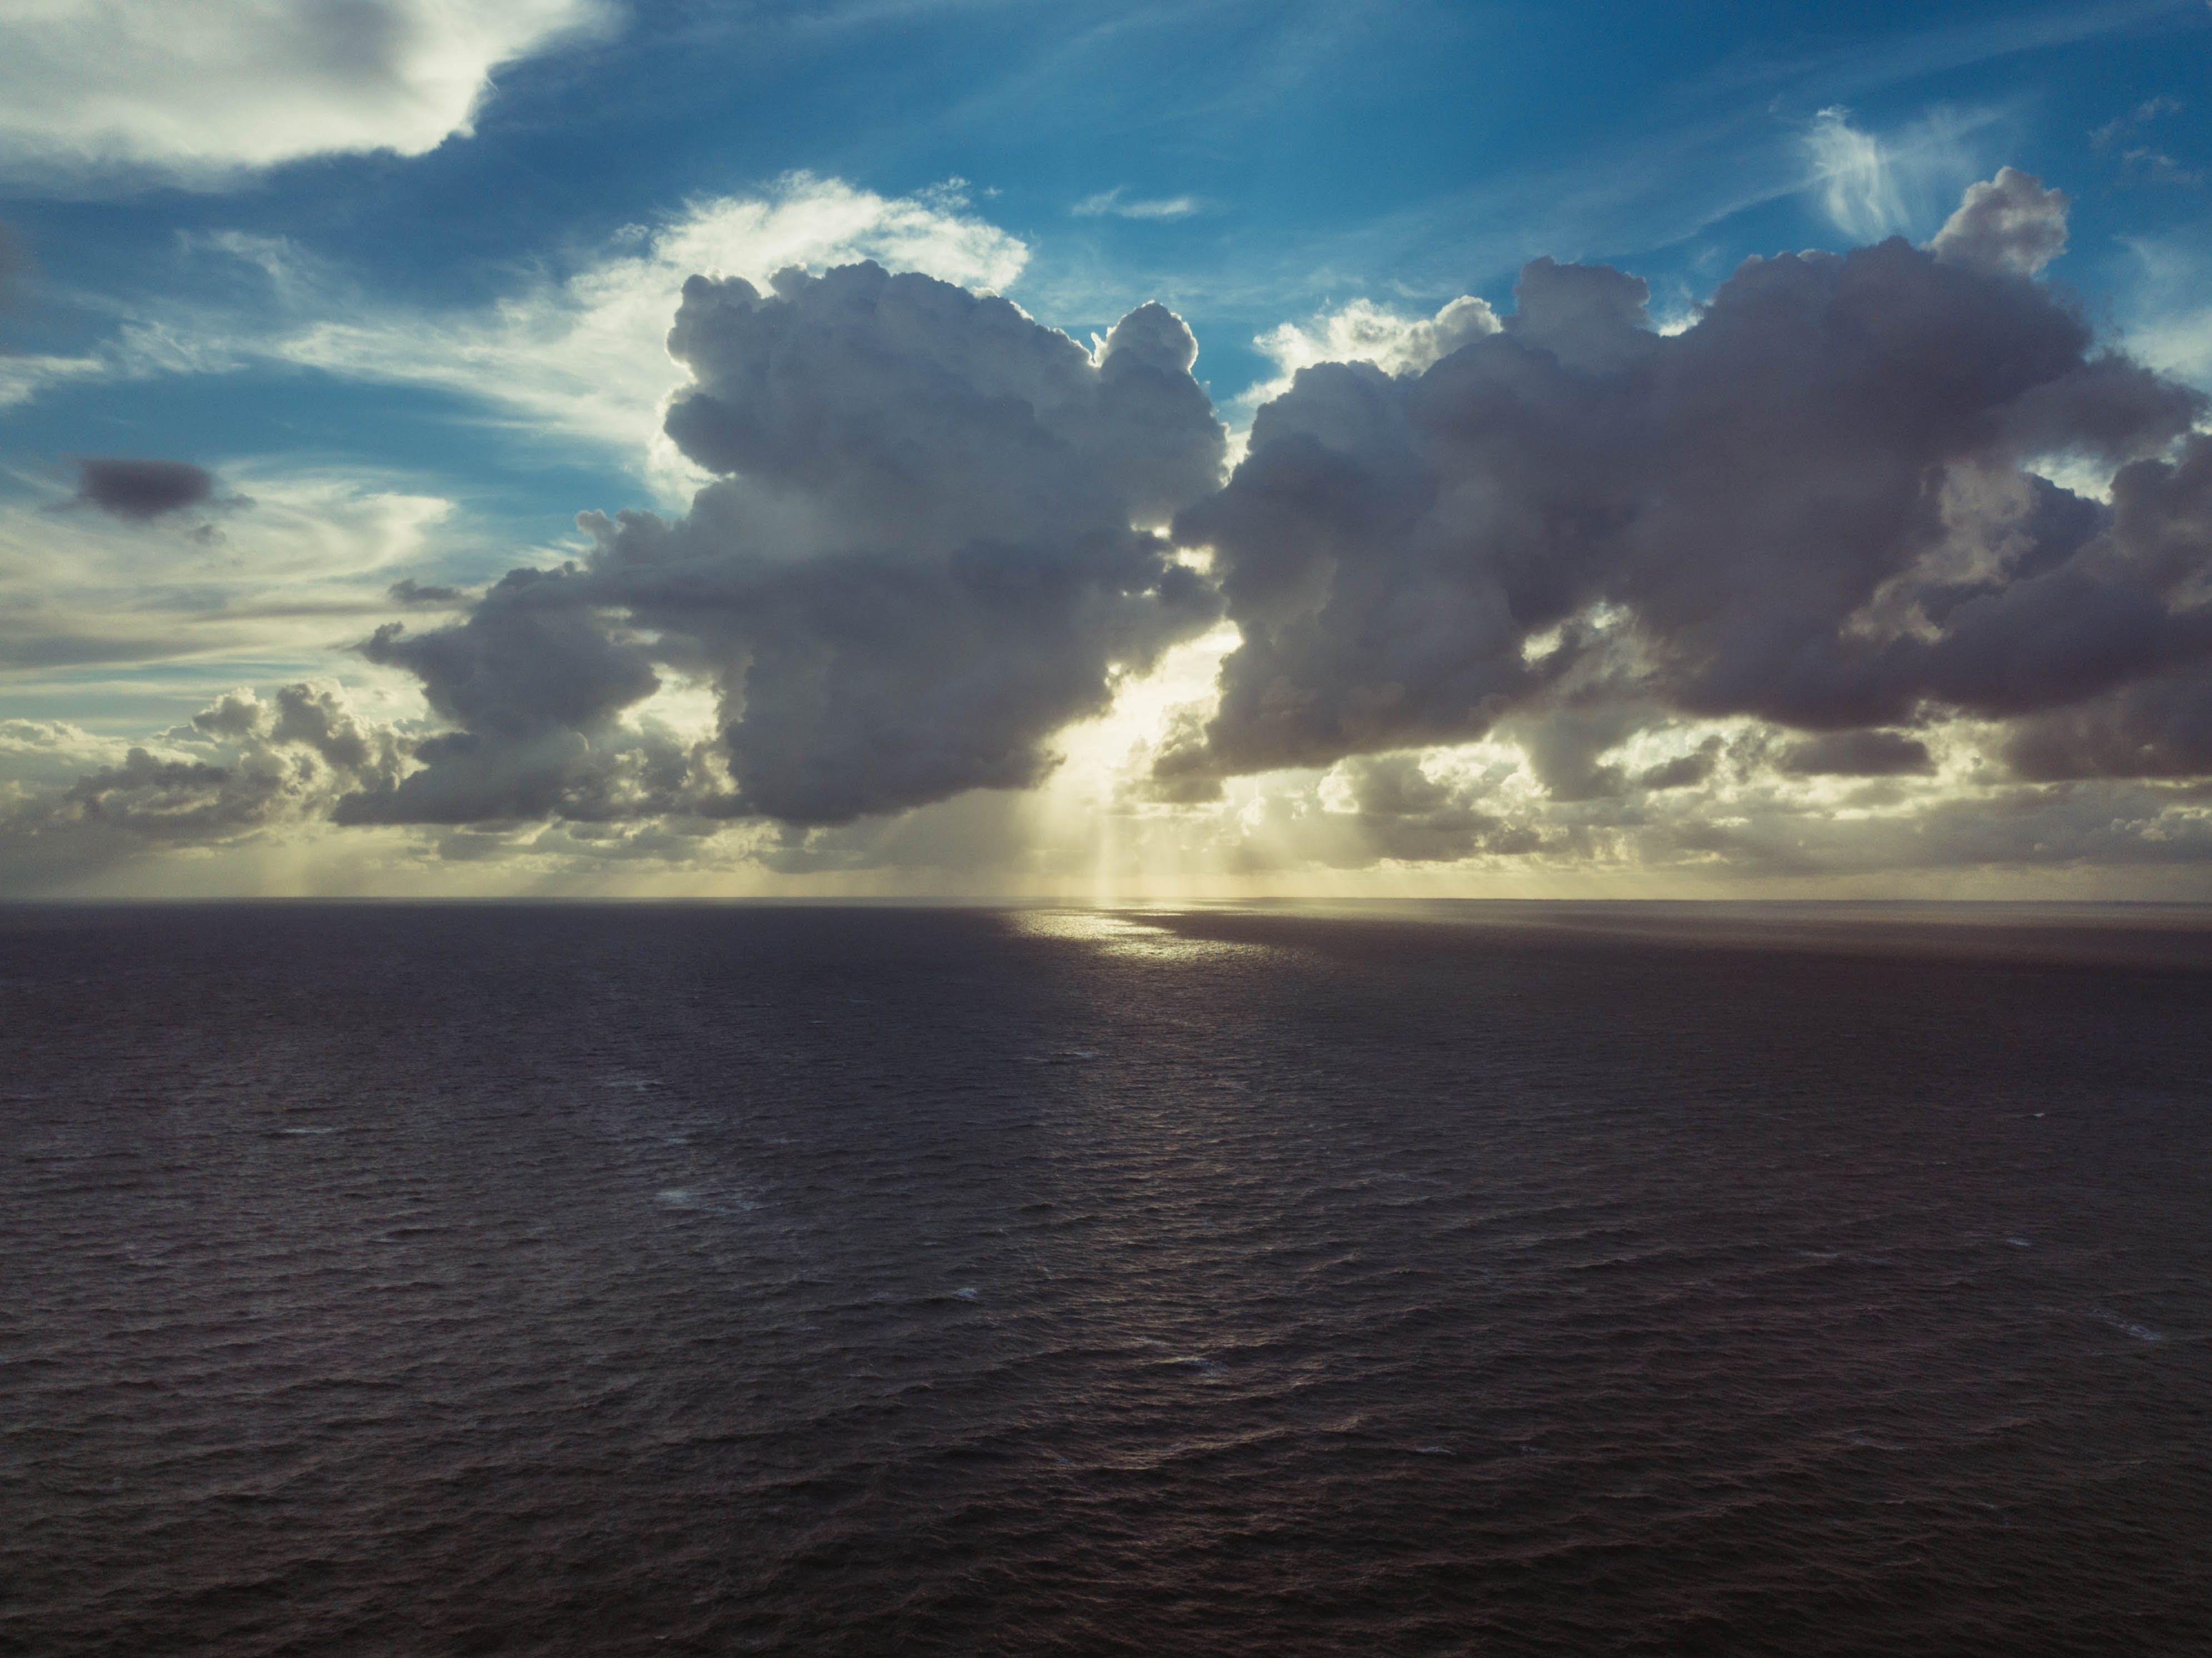 Dark Clouds at the Sea